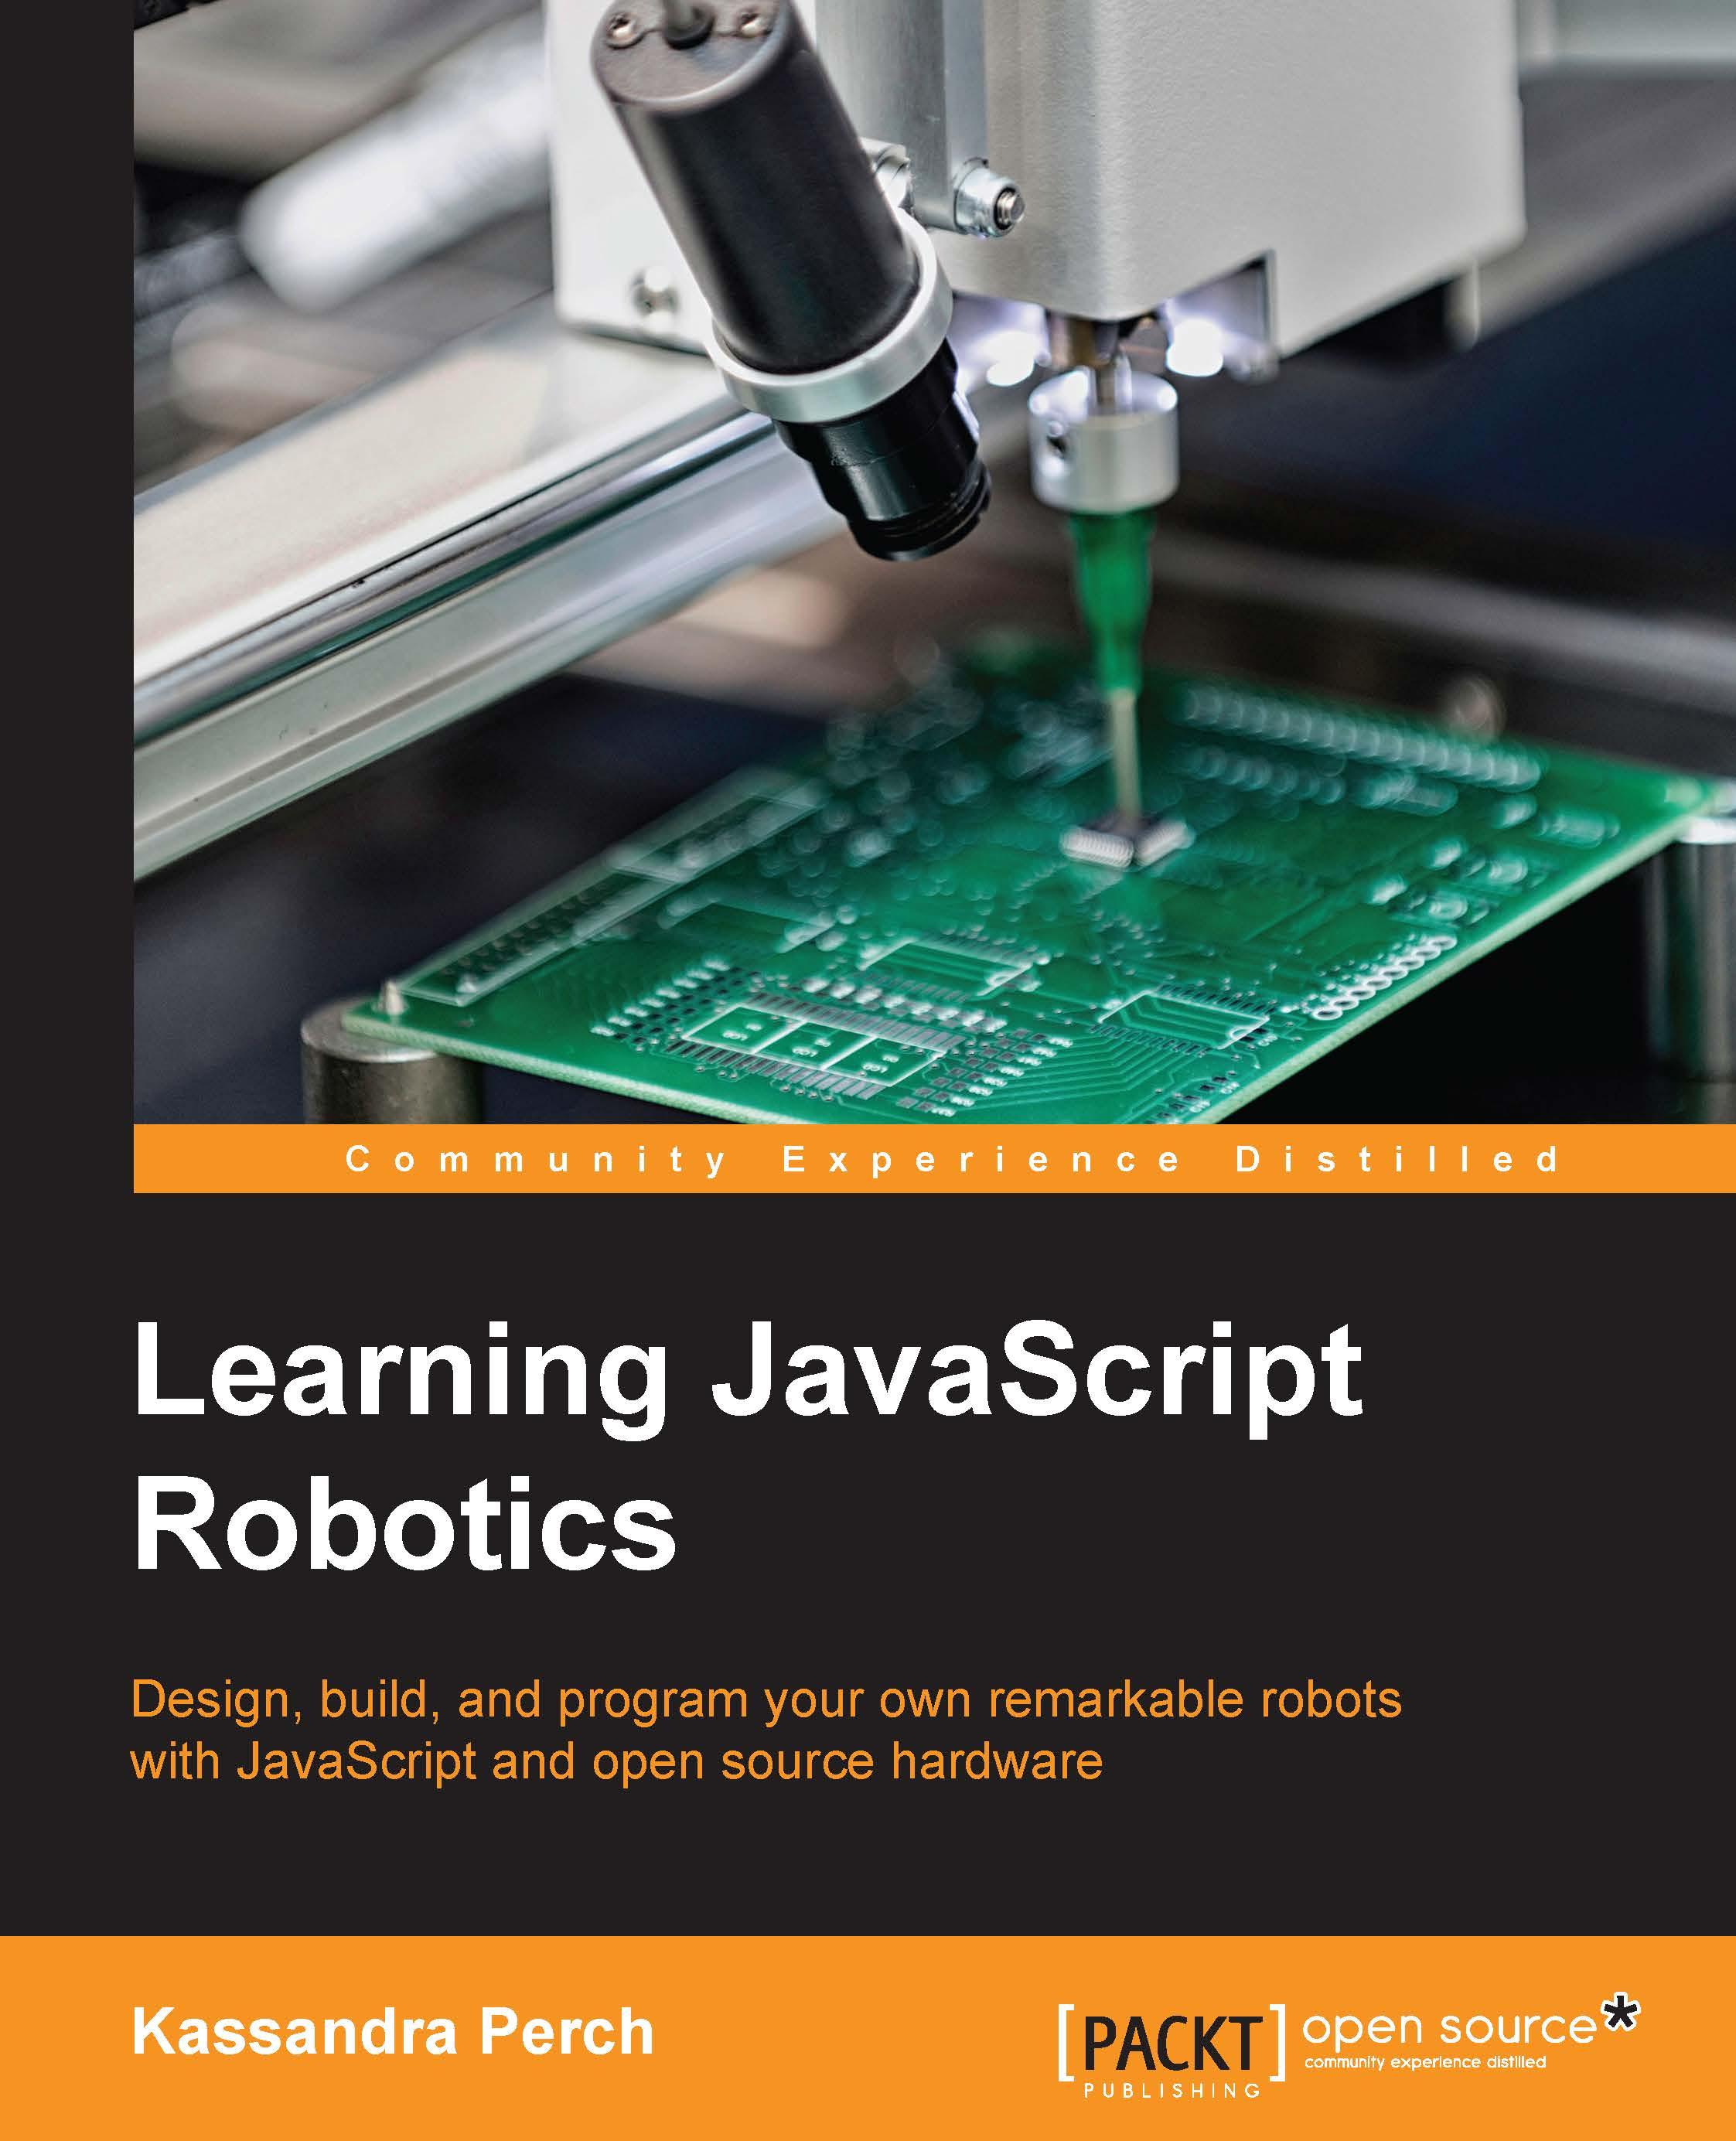 Learning JavaScript Robotics by Kassandra Perch | Read online | PDF